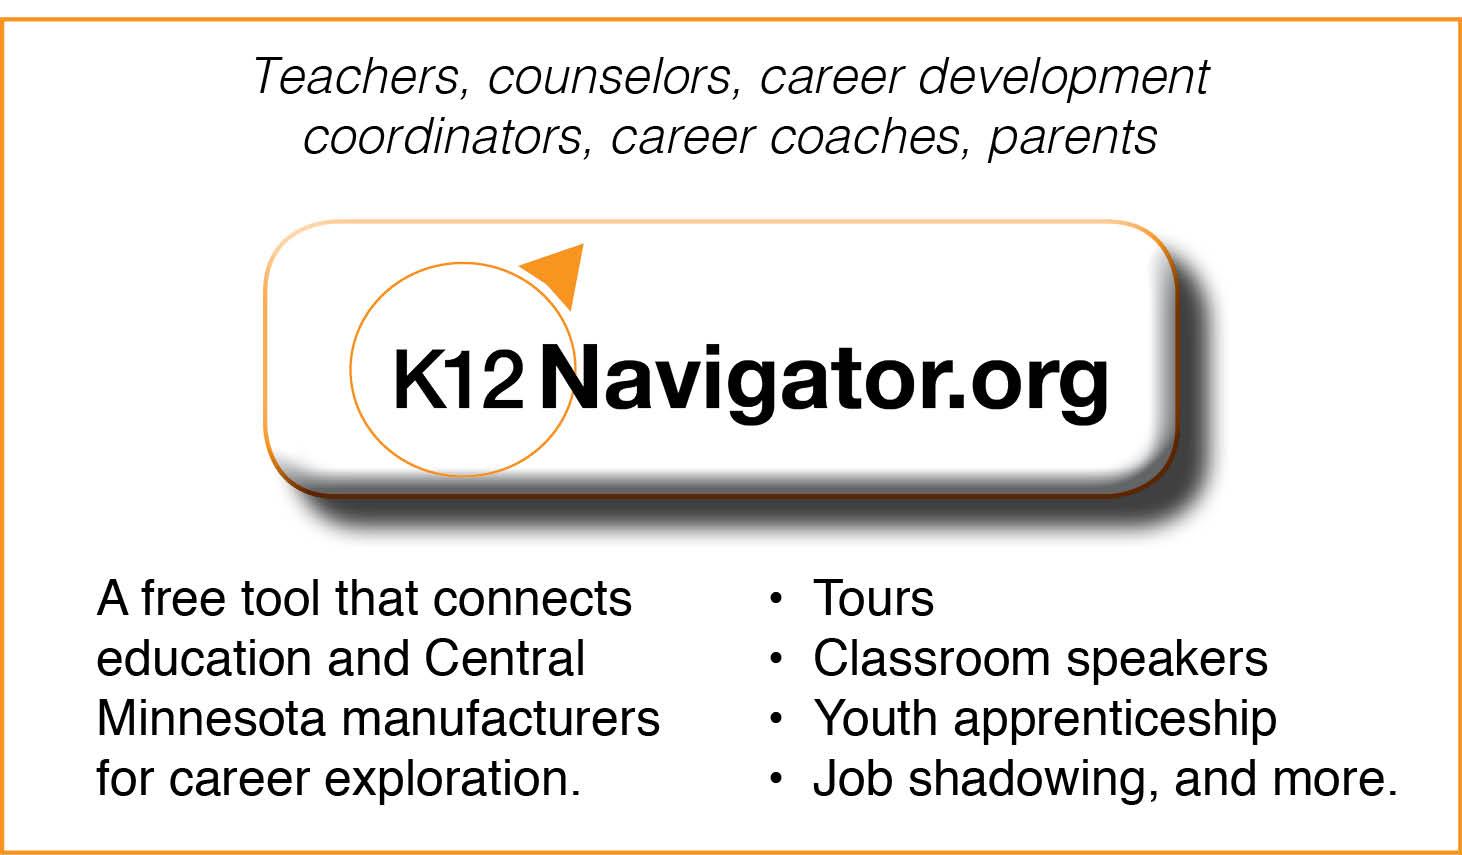 NavigatorAdforWebVs2